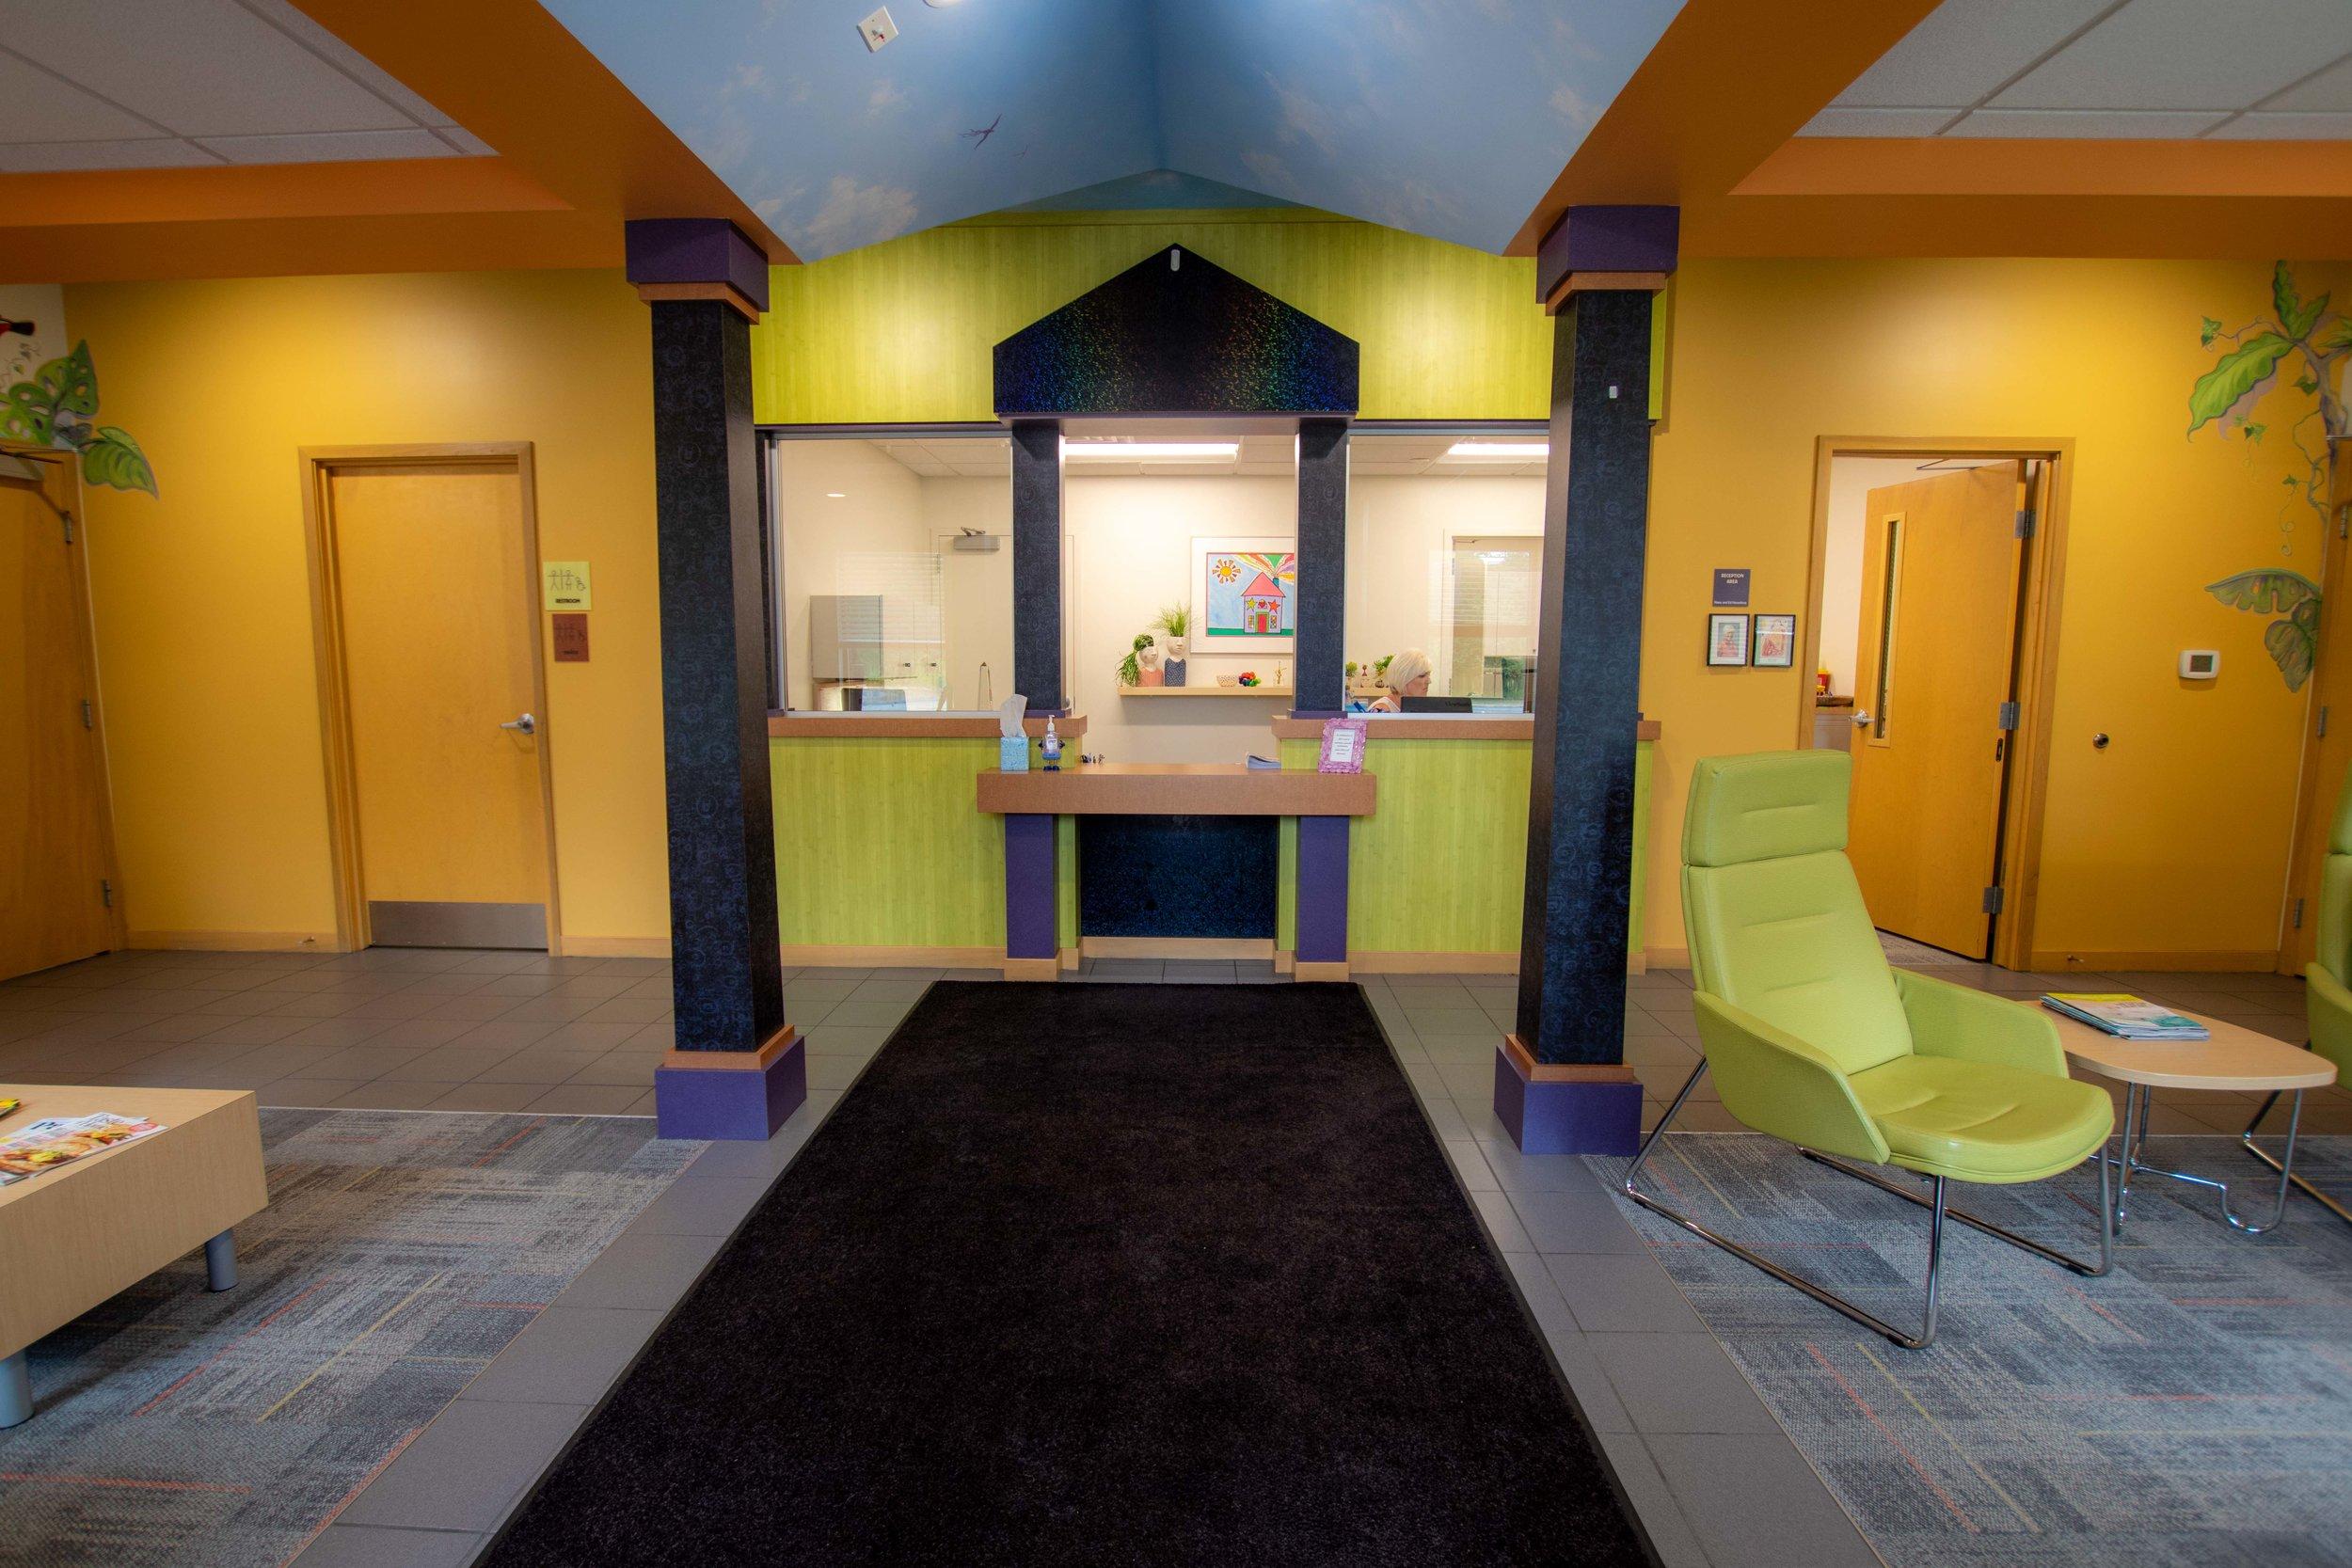 Entrance & Waiting Room -